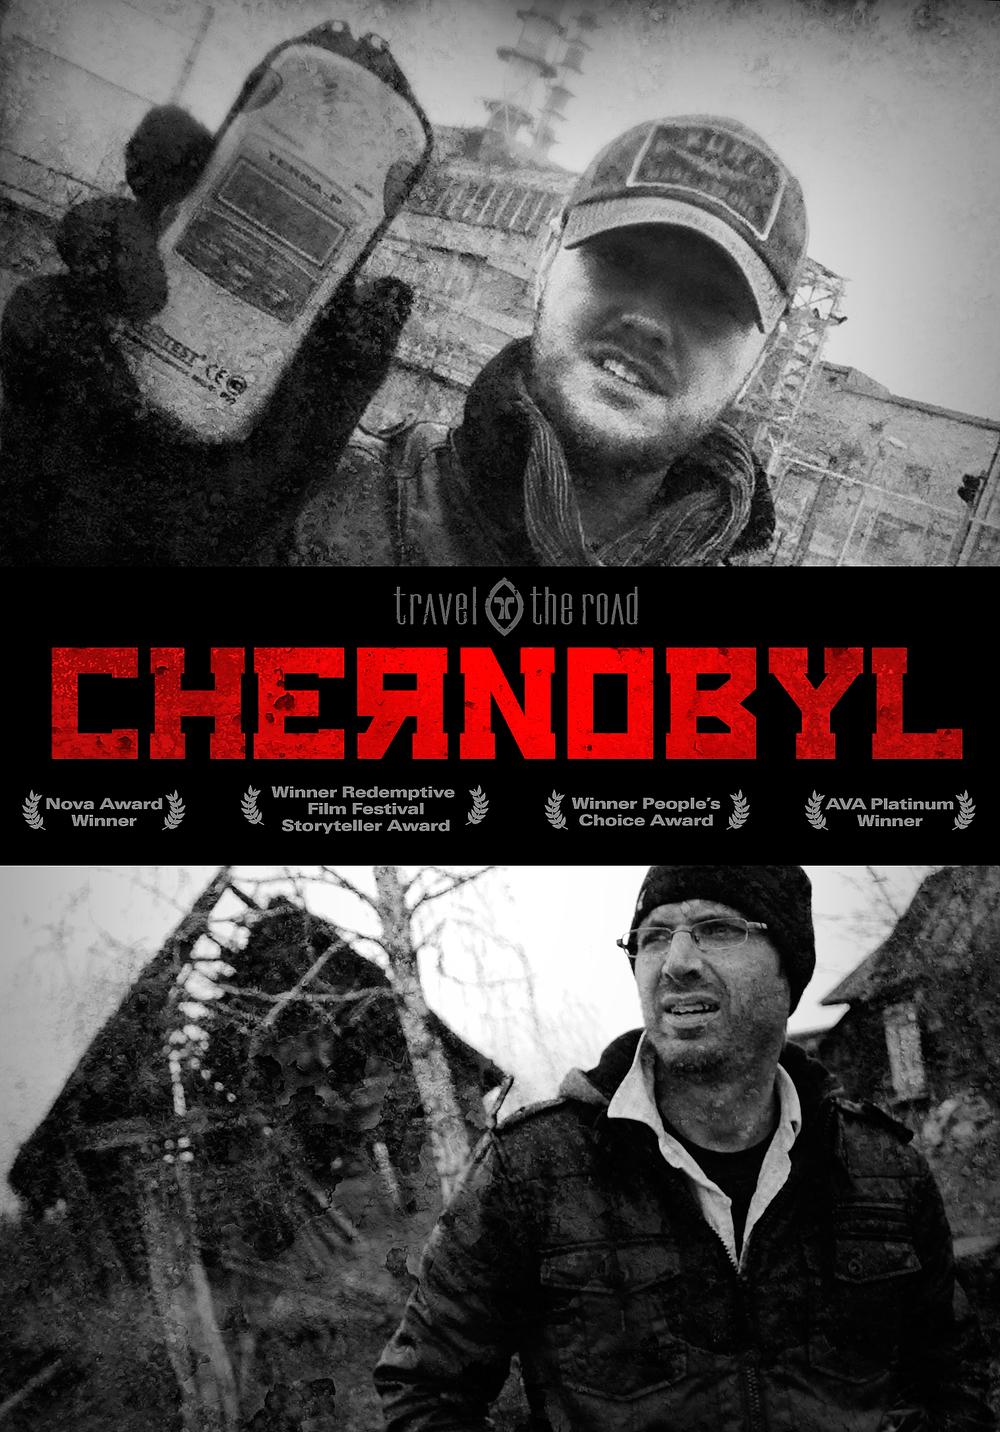 ttr chernobyl image v2 hi res  (1).jpg